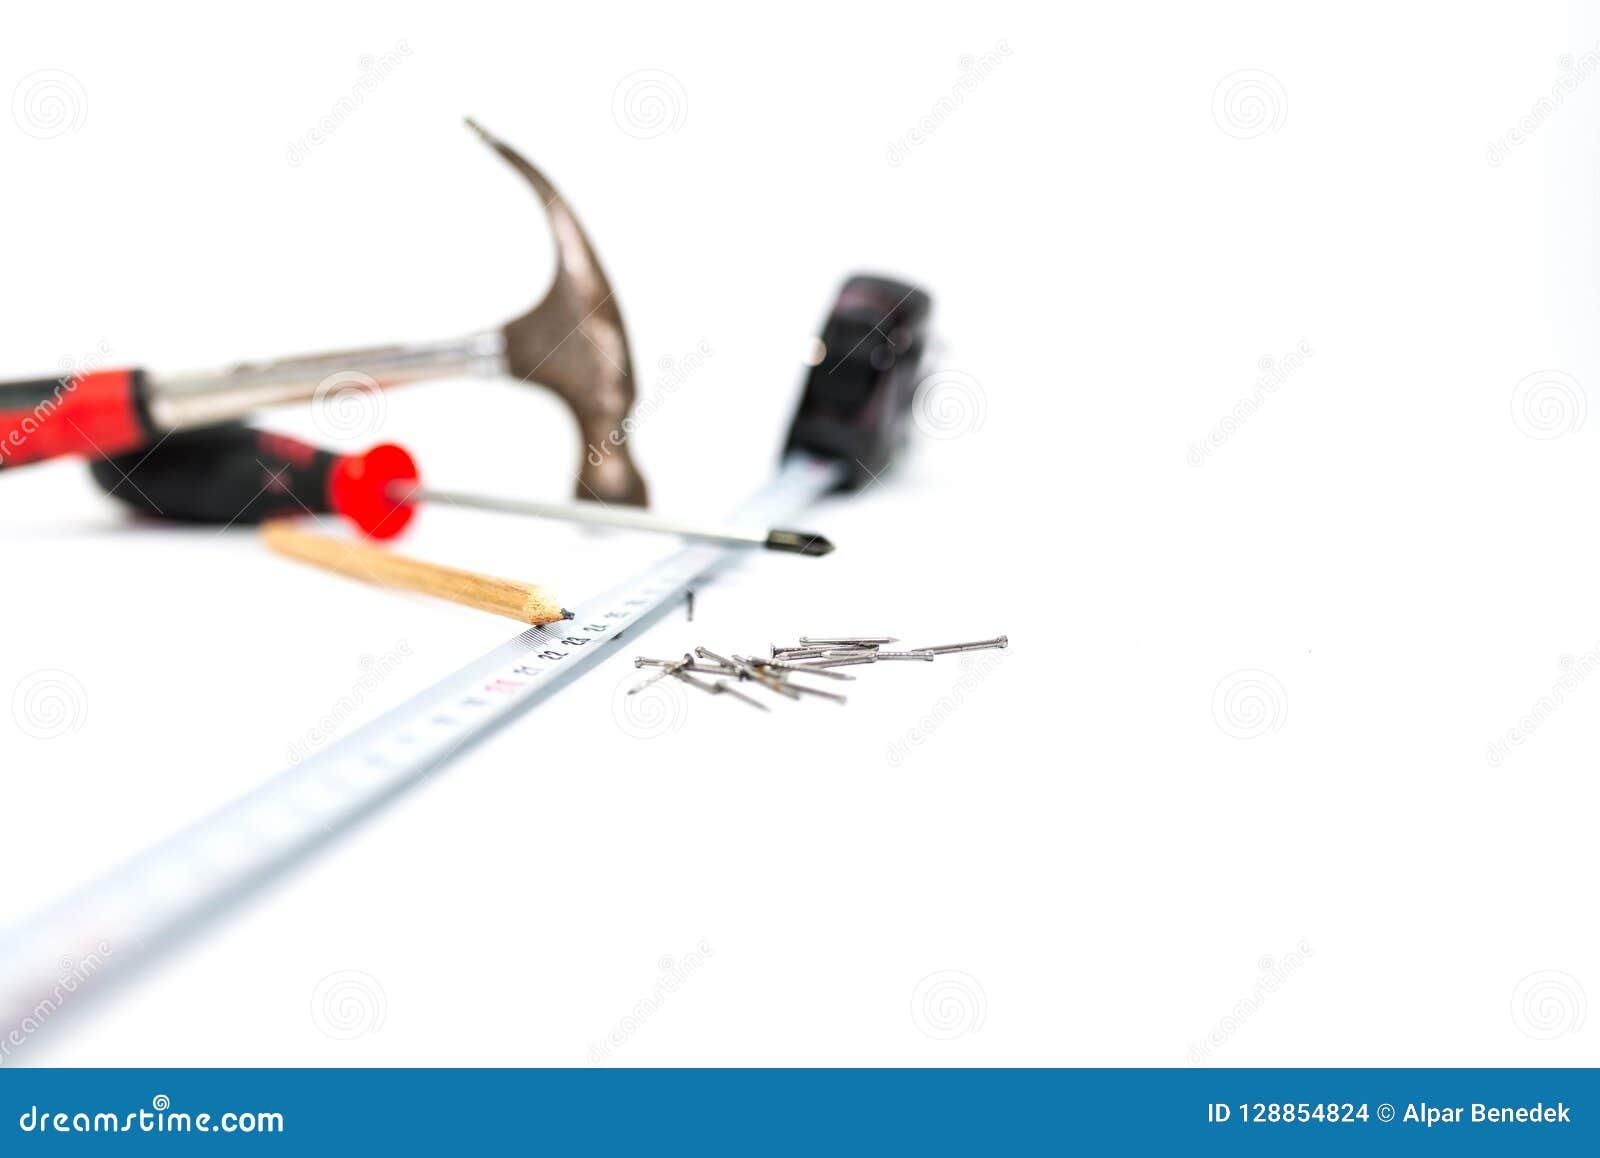 Entregue ferramentas no fundo, no martelo, na chave de fenda, na régua, no lápis e nos pregos brancos, profundidade de campo rasa